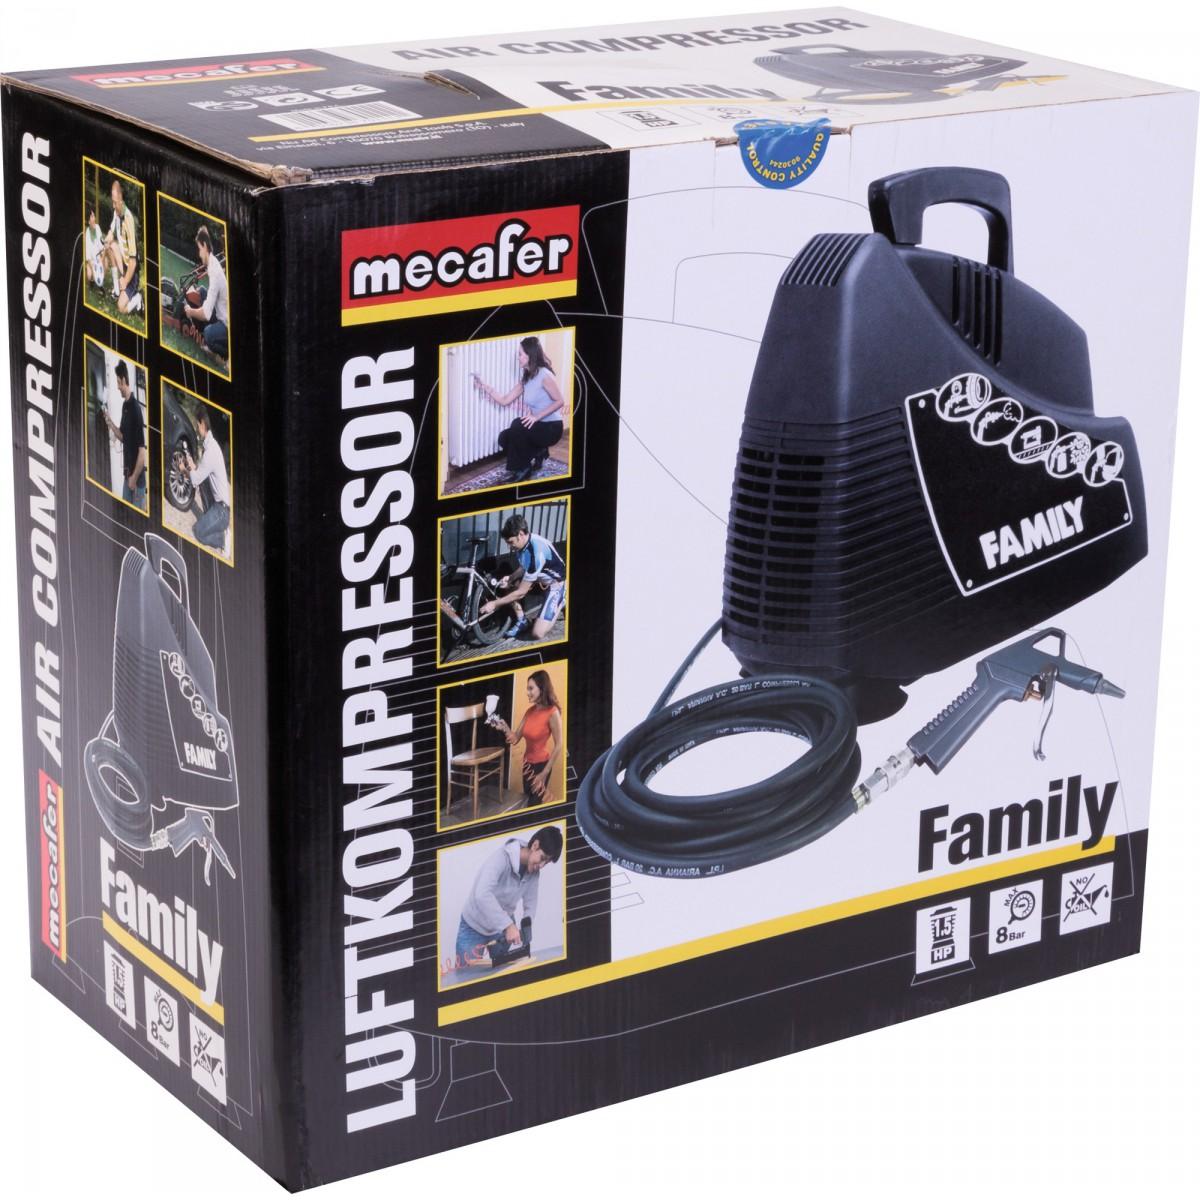 Compresseur sans cuve portatif Family Mecafer - 1,5 CV